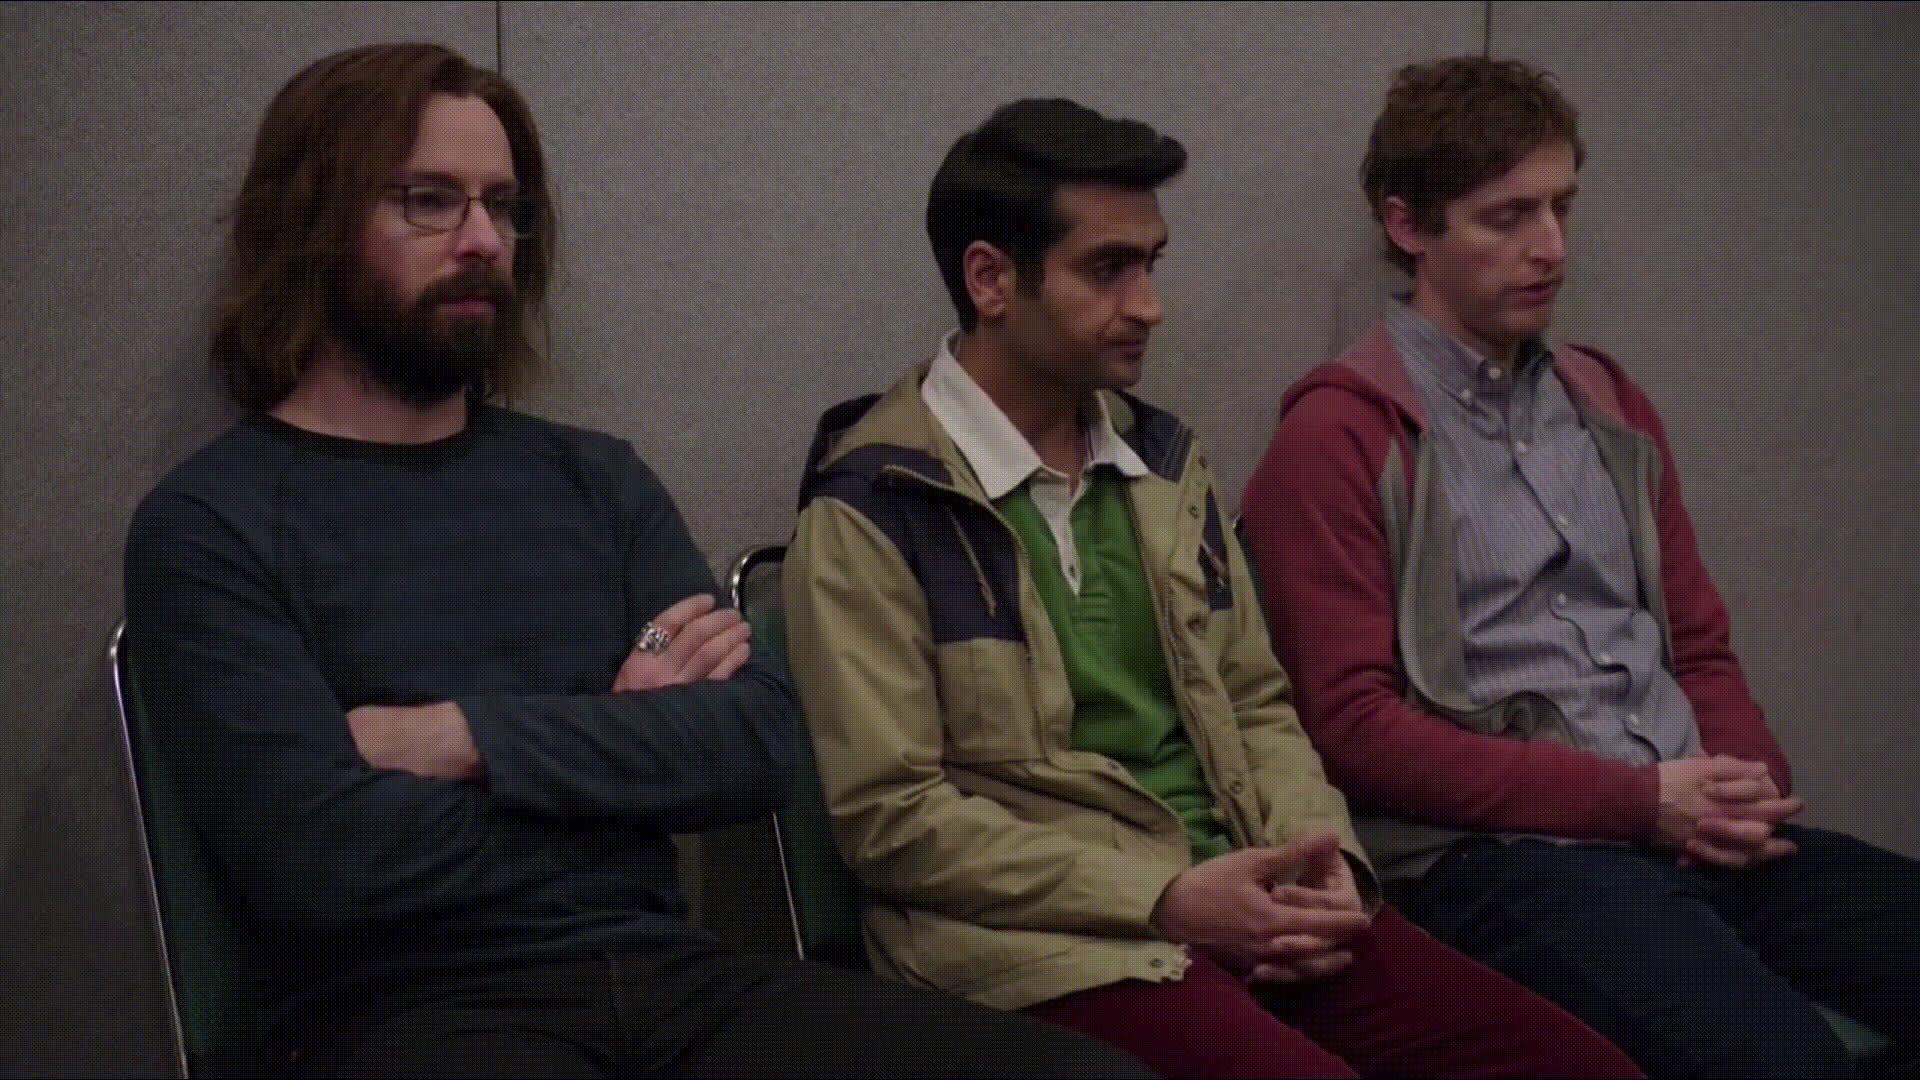 SiliconValleyHBO, Zach Woods, popular, Poopfare... Poopfare! (reddit) GIFs